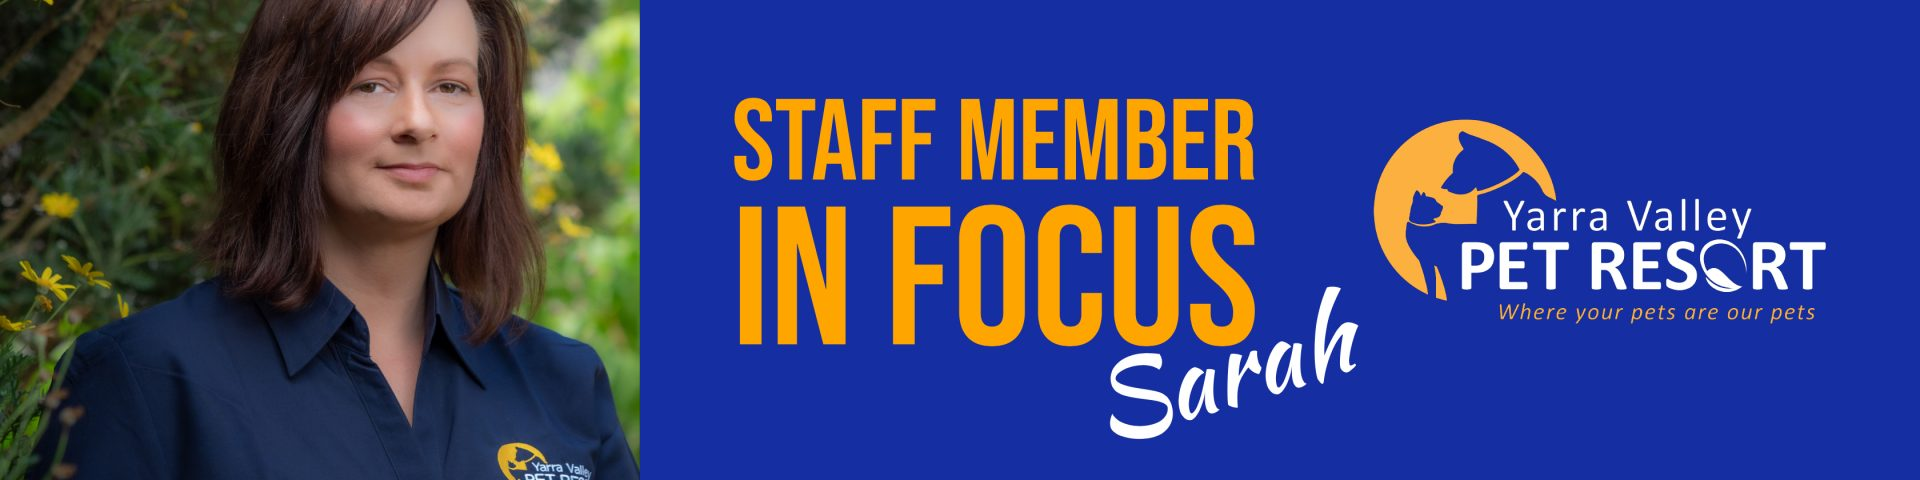 Staff Member In Focus – Sarah – Events Co-ordinator/Marketing